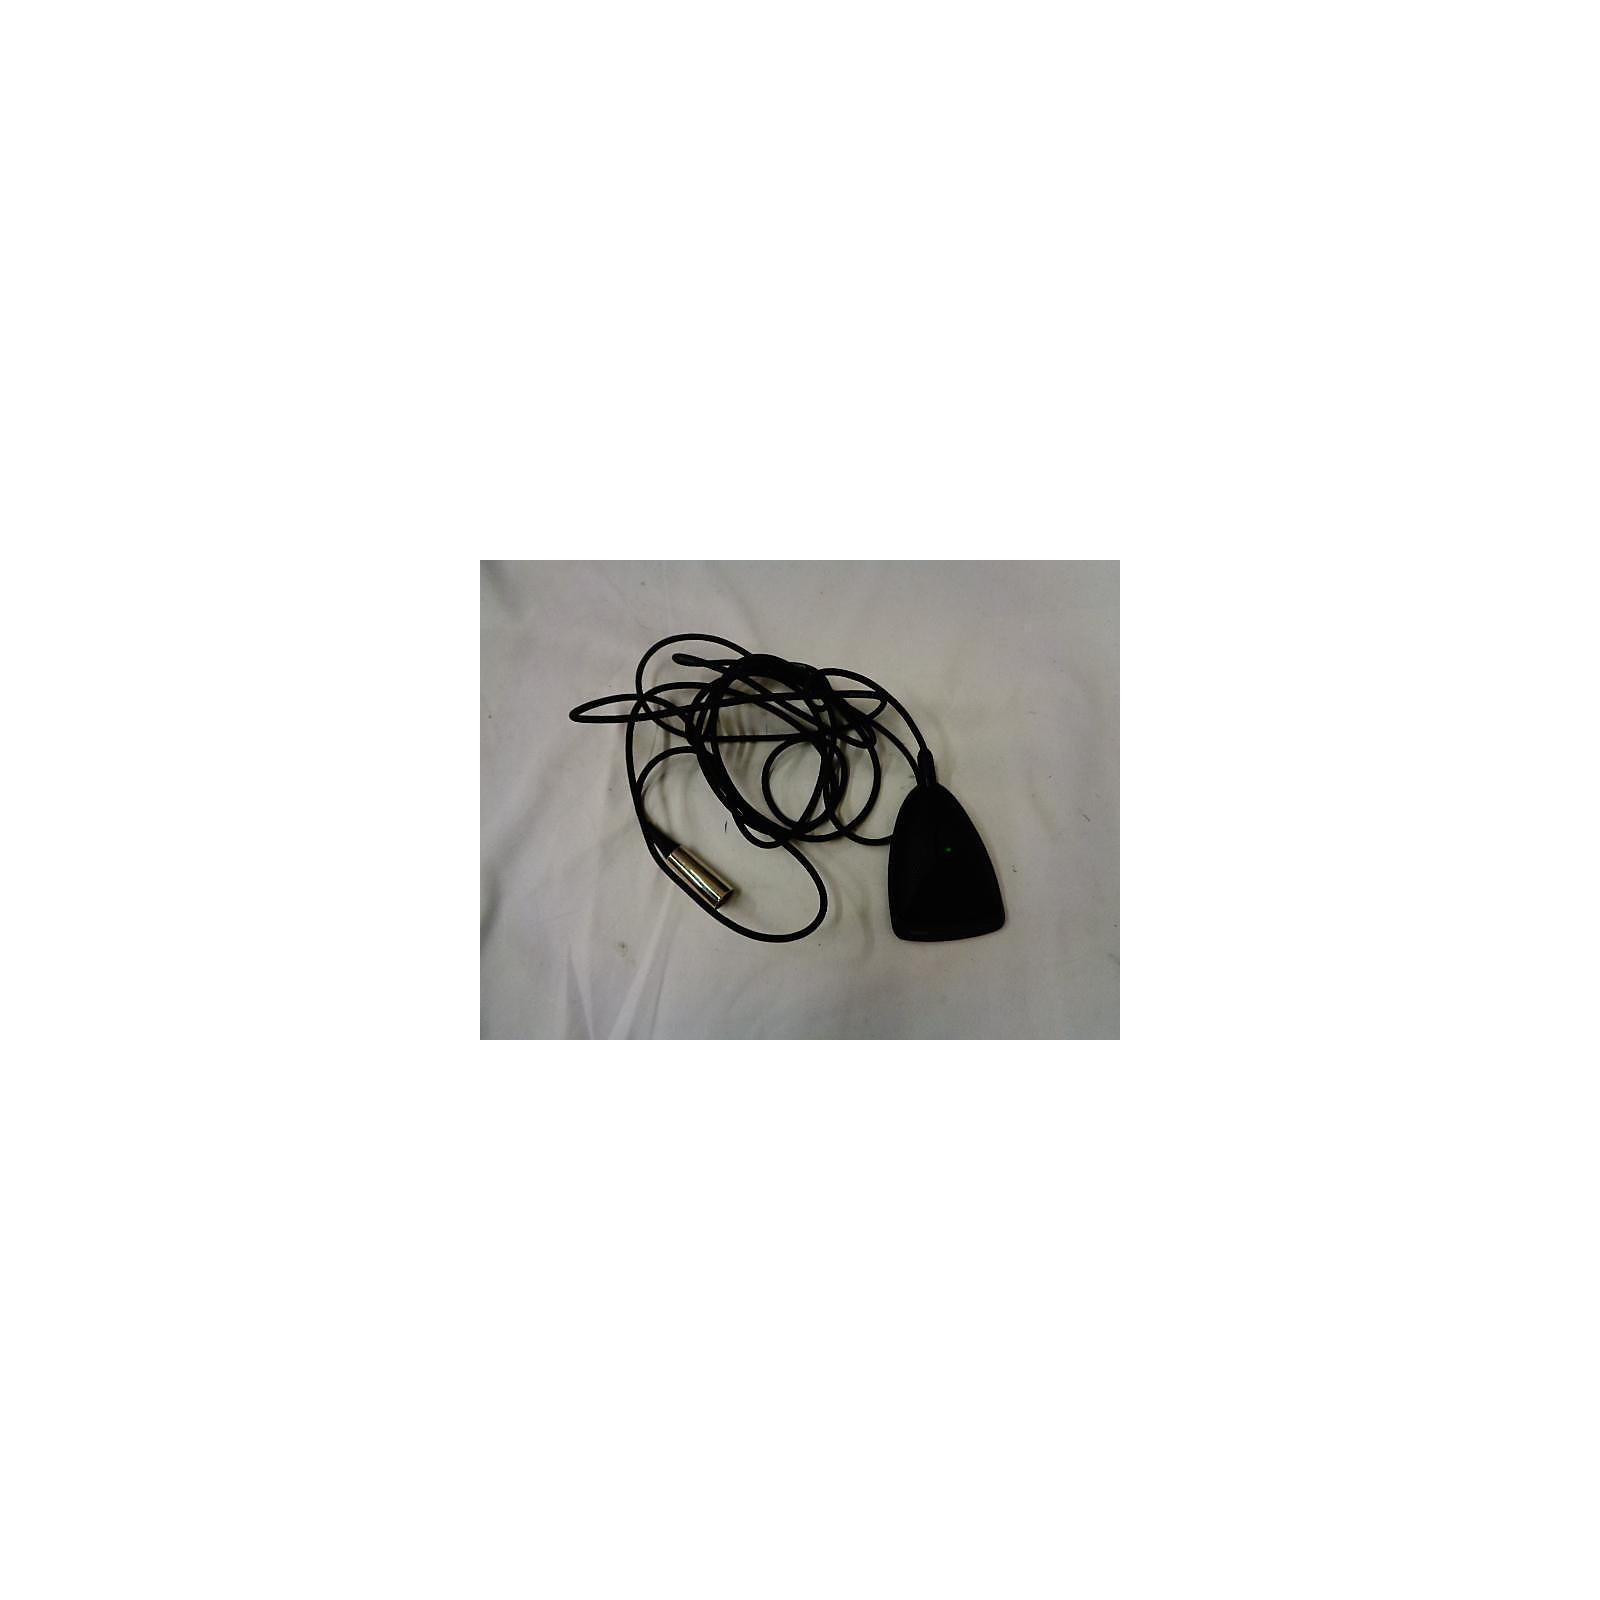 Shure Microflex/C Cardioid Dynamic Microphone